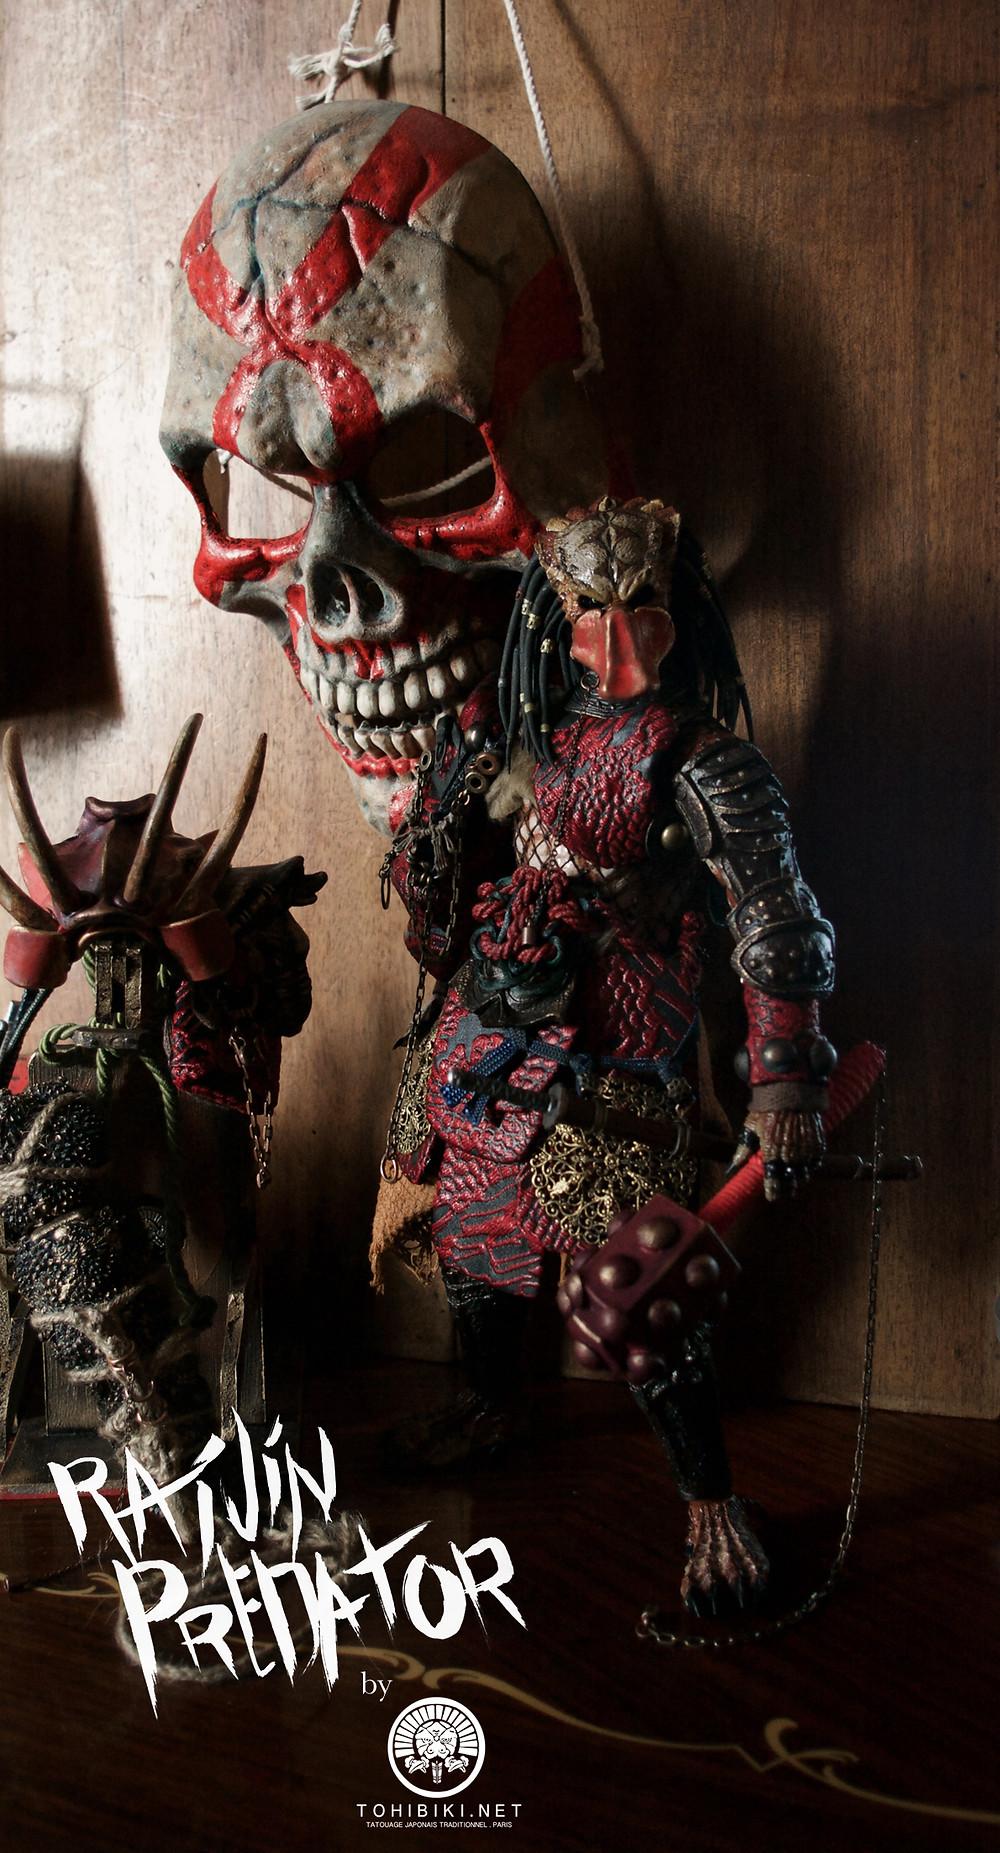 Hottoys Predator Samurai by Kuroi Tohibiki. Hot Toys Predator. IREZUMI, Paris.